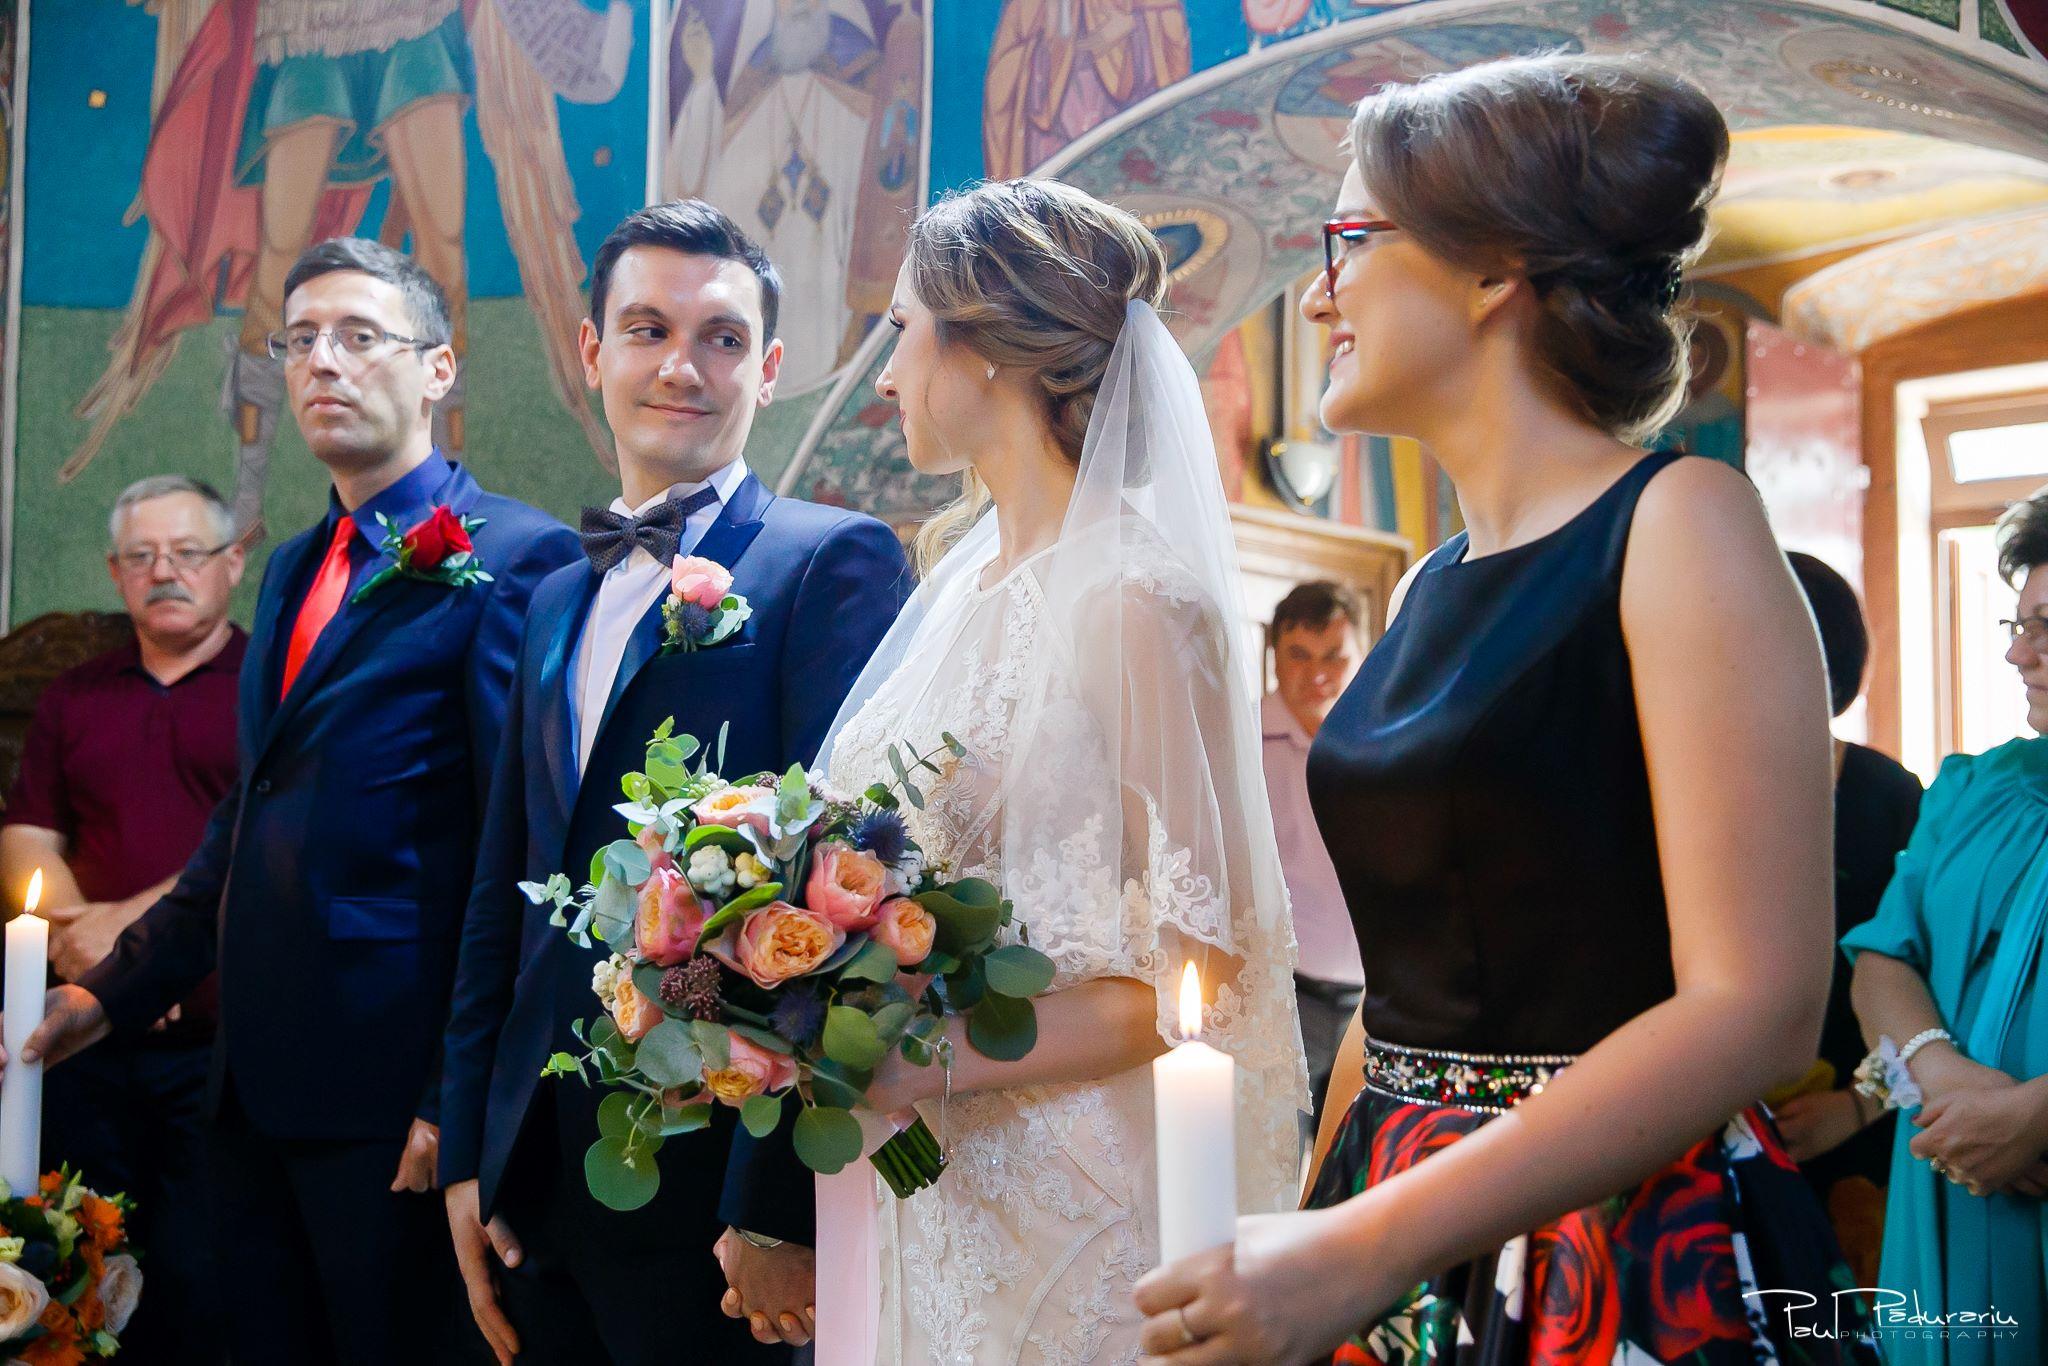 Nicoleta si Catalin fotografie nunta Iasi Biserica Rotunda Letcani fotograf nunta Iasi paul padurariu 2018 6